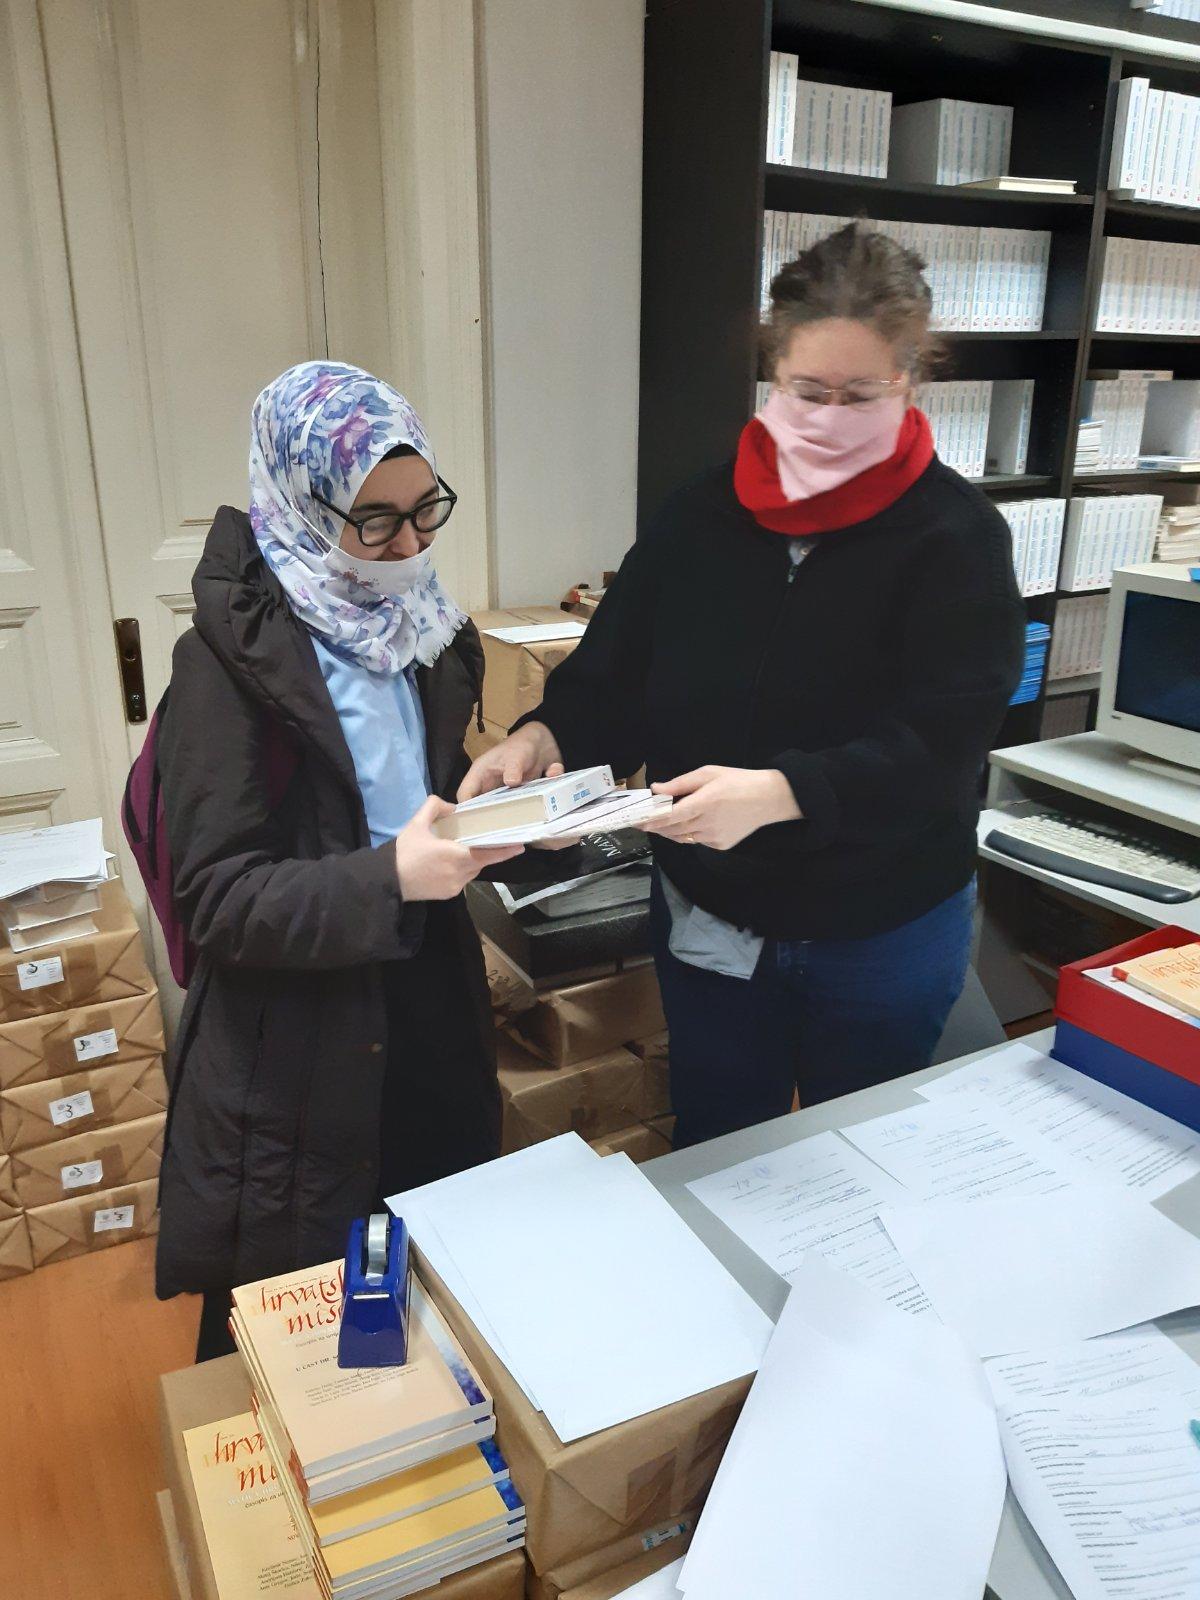 Uspjeh na književnoj smotri sarajevskih srednjoškolaca